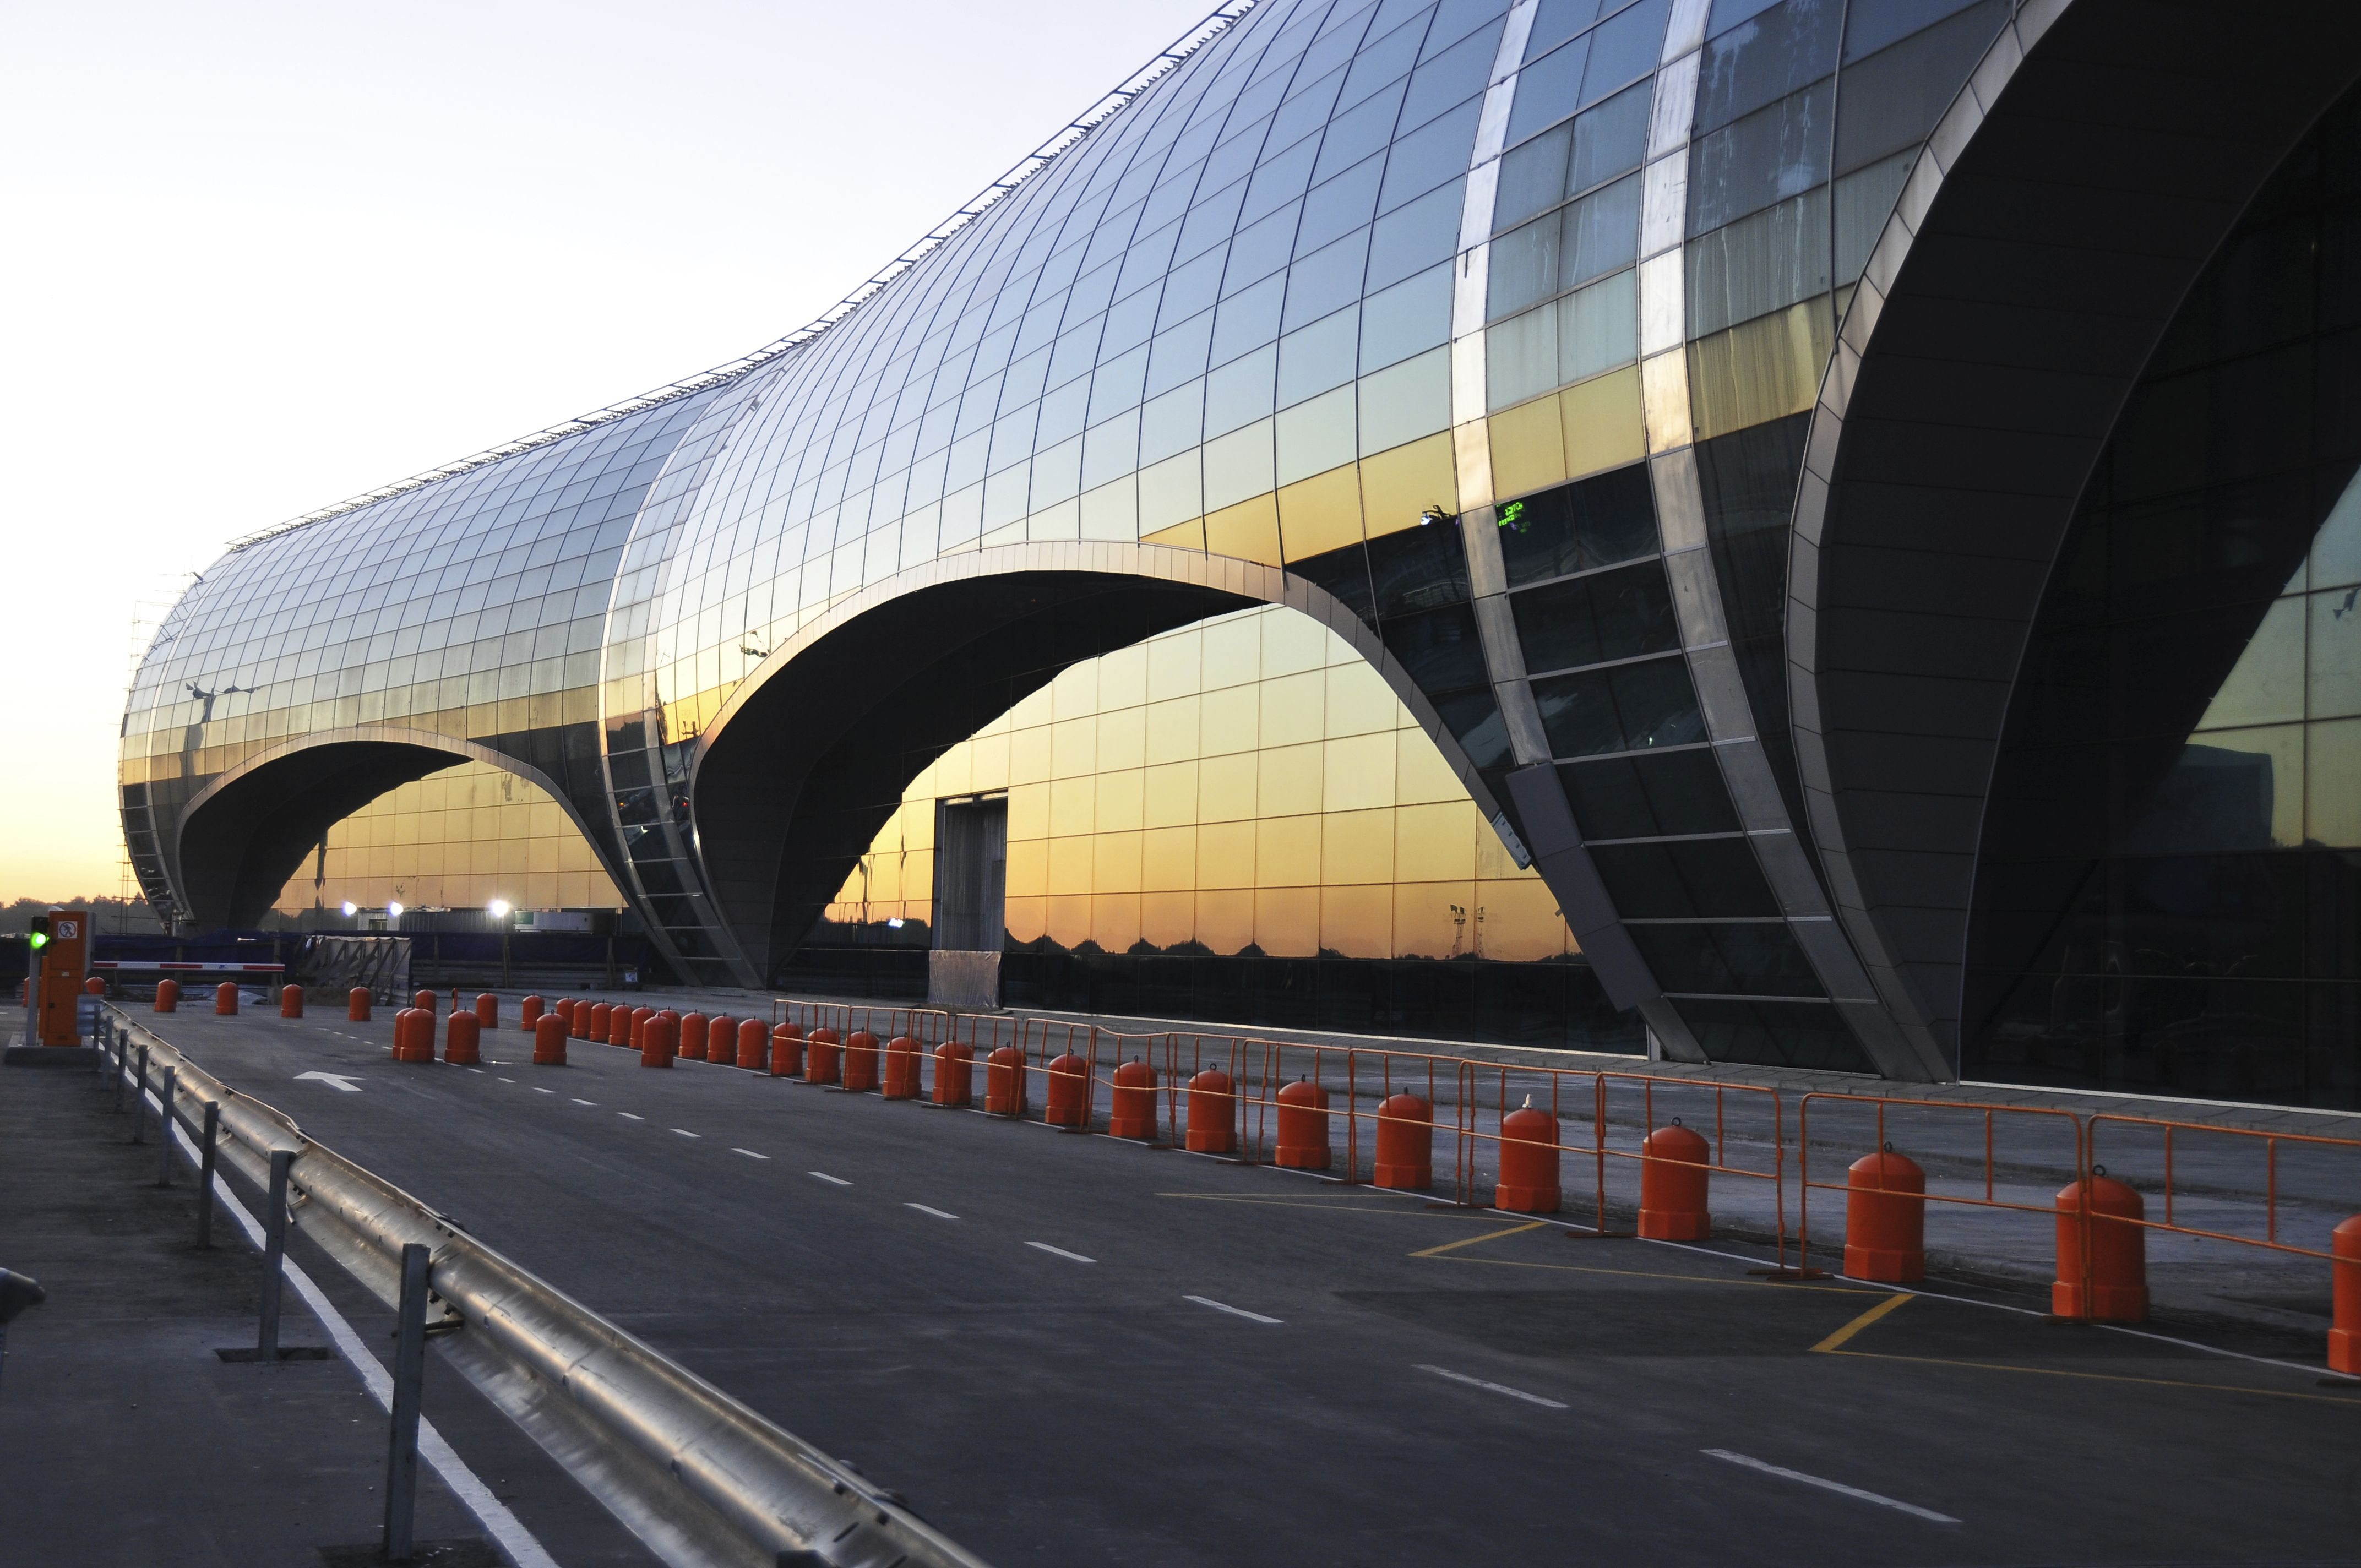 Sundown over Moscow Domodedovo International